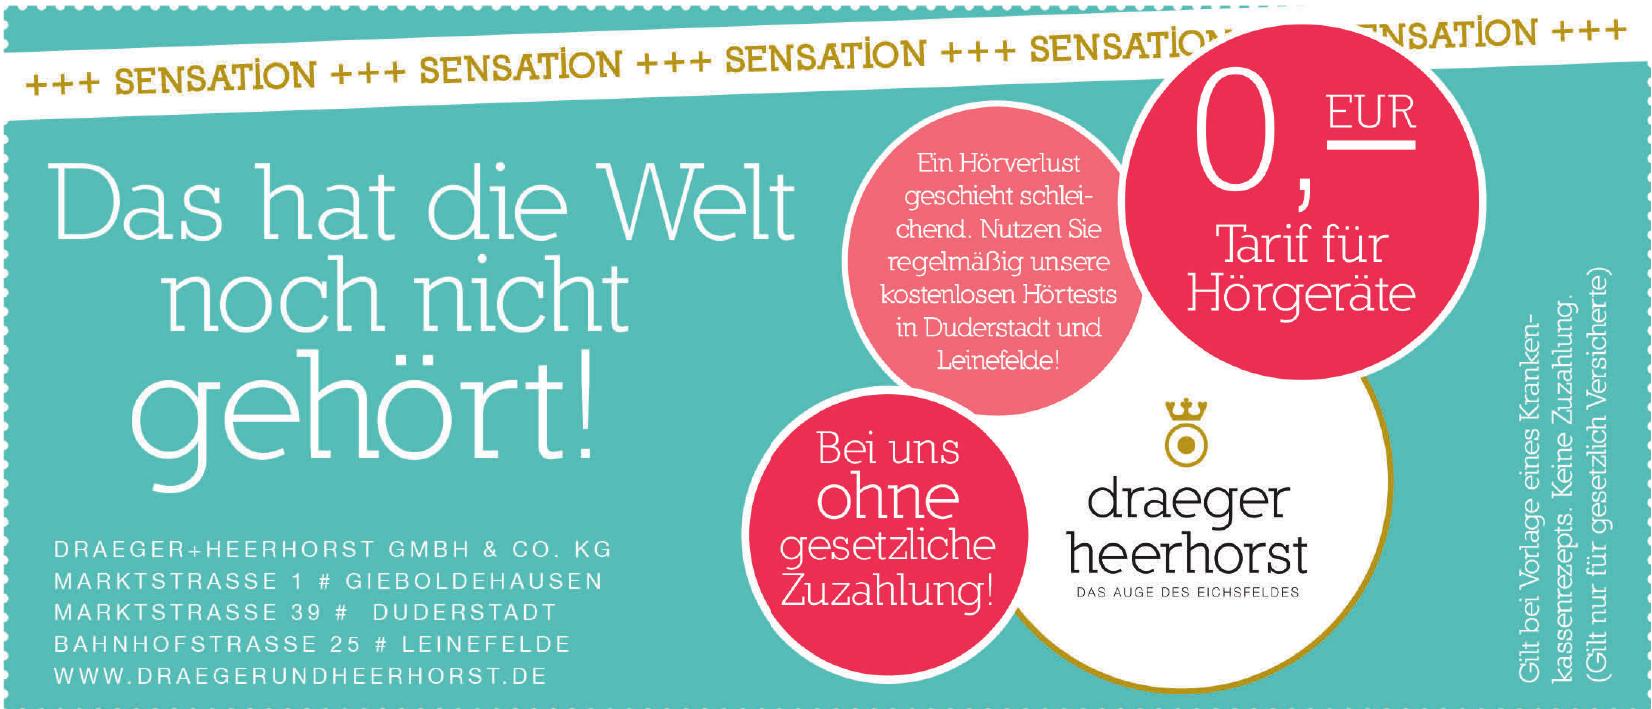 Draeger+Heerhorst Gmbh & Co. KG